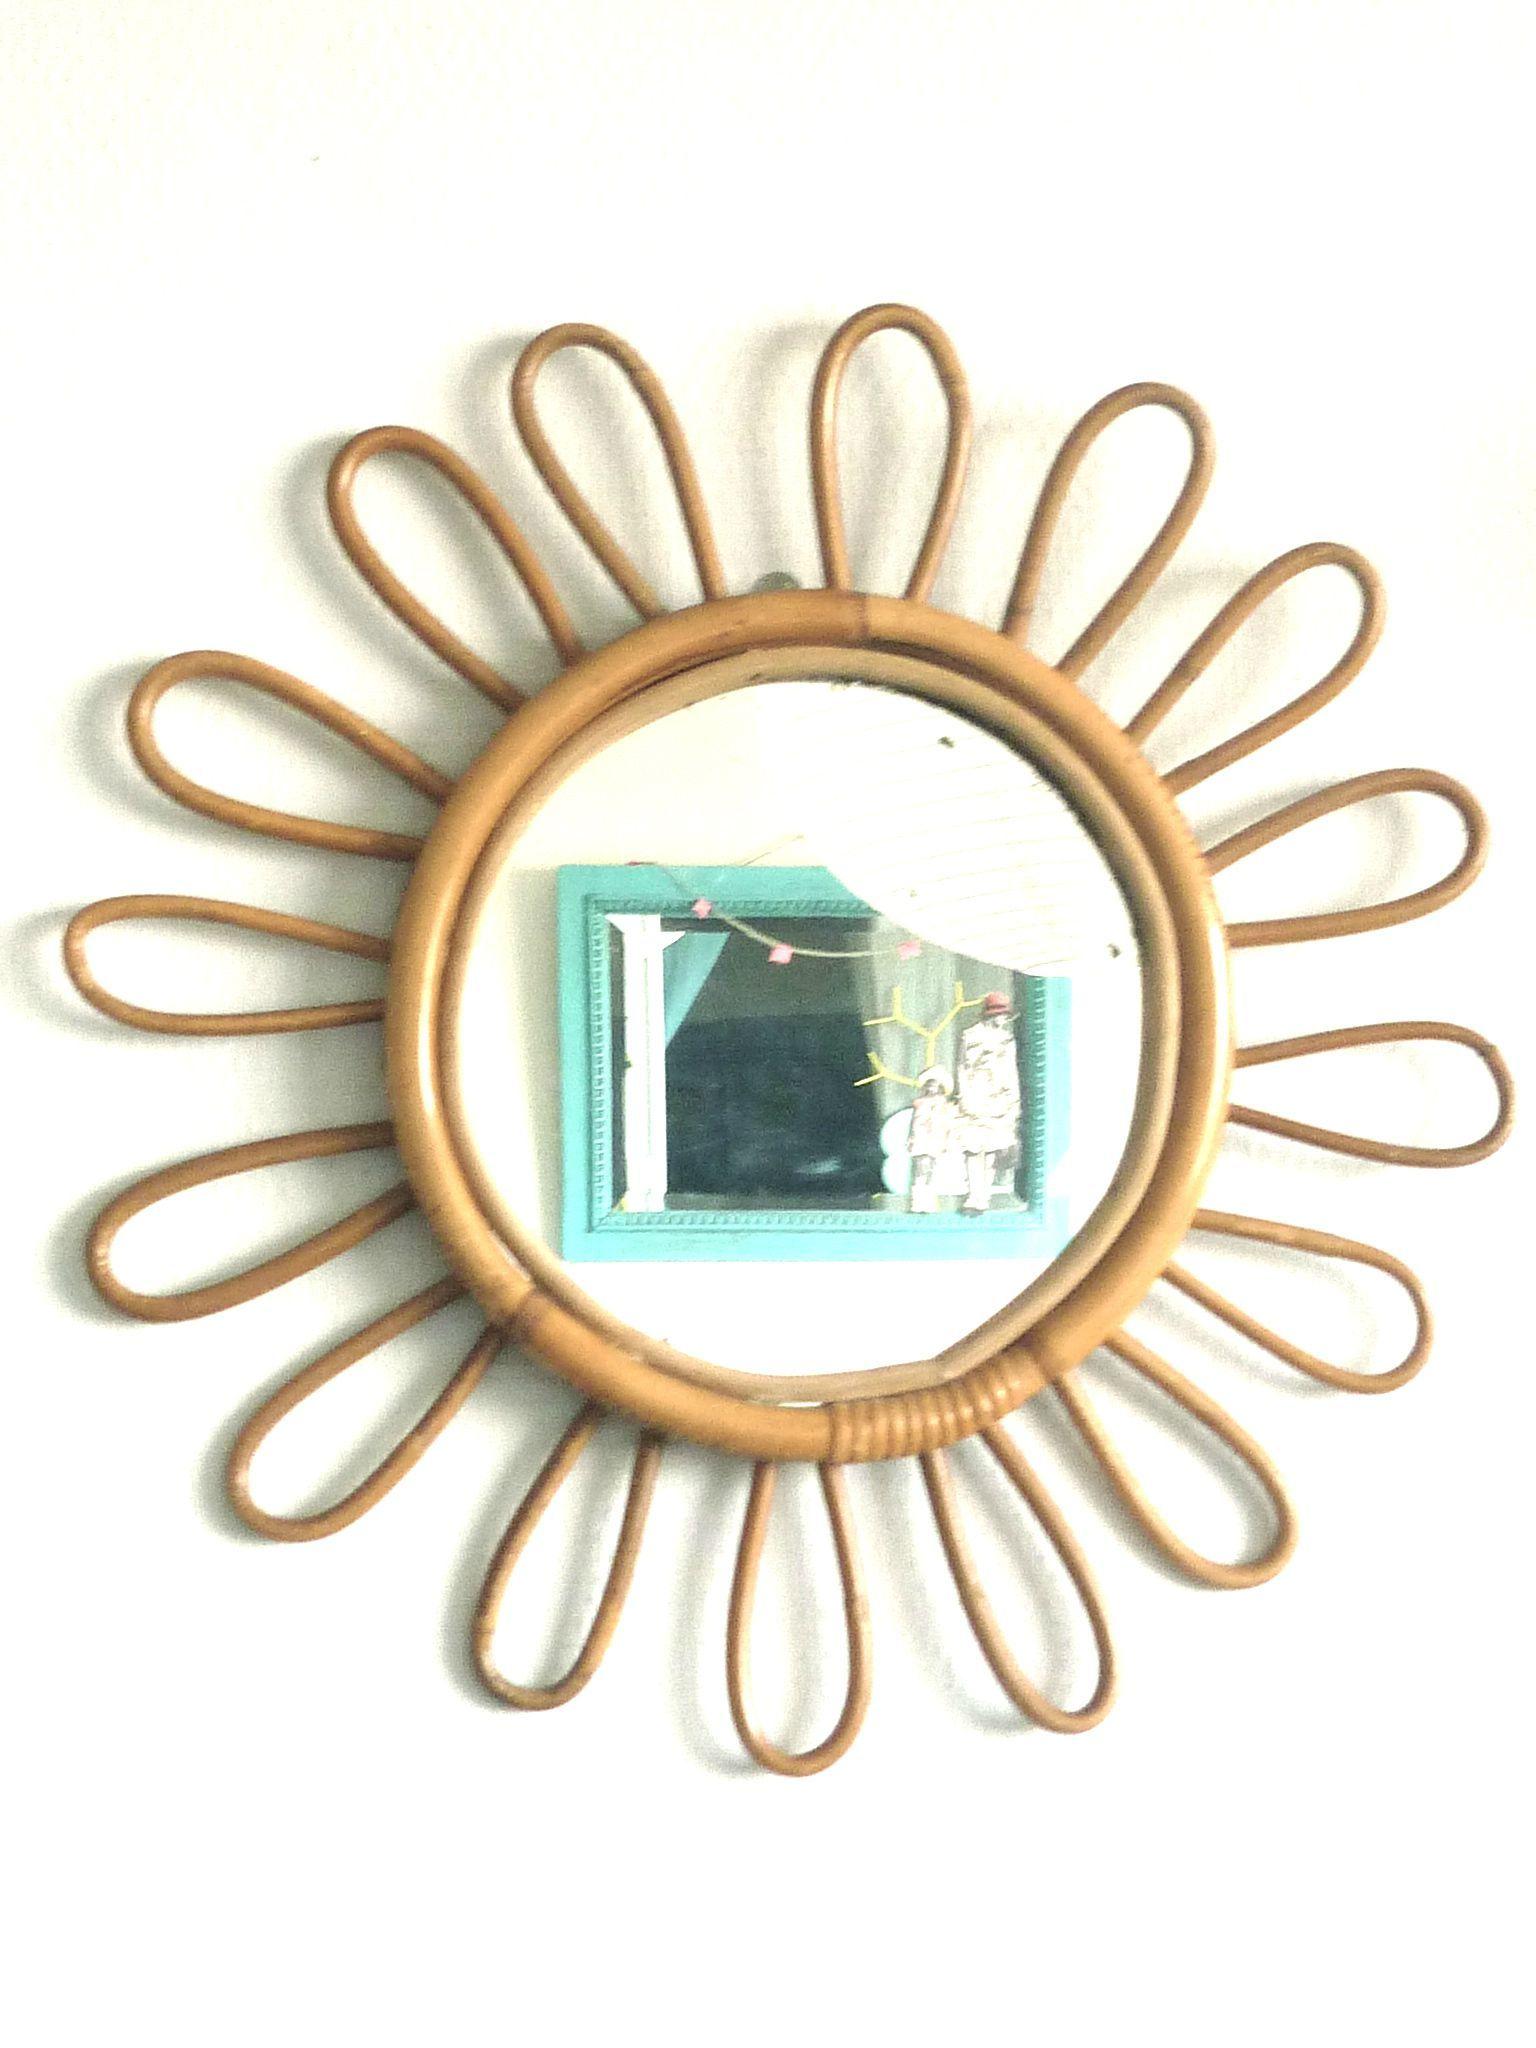 Recherche Miroir Rotin En Forme De Fleur Ou Soleil Brocante Videgreniers Miroir En Rotin Miroir Fleur Miroir Vintage